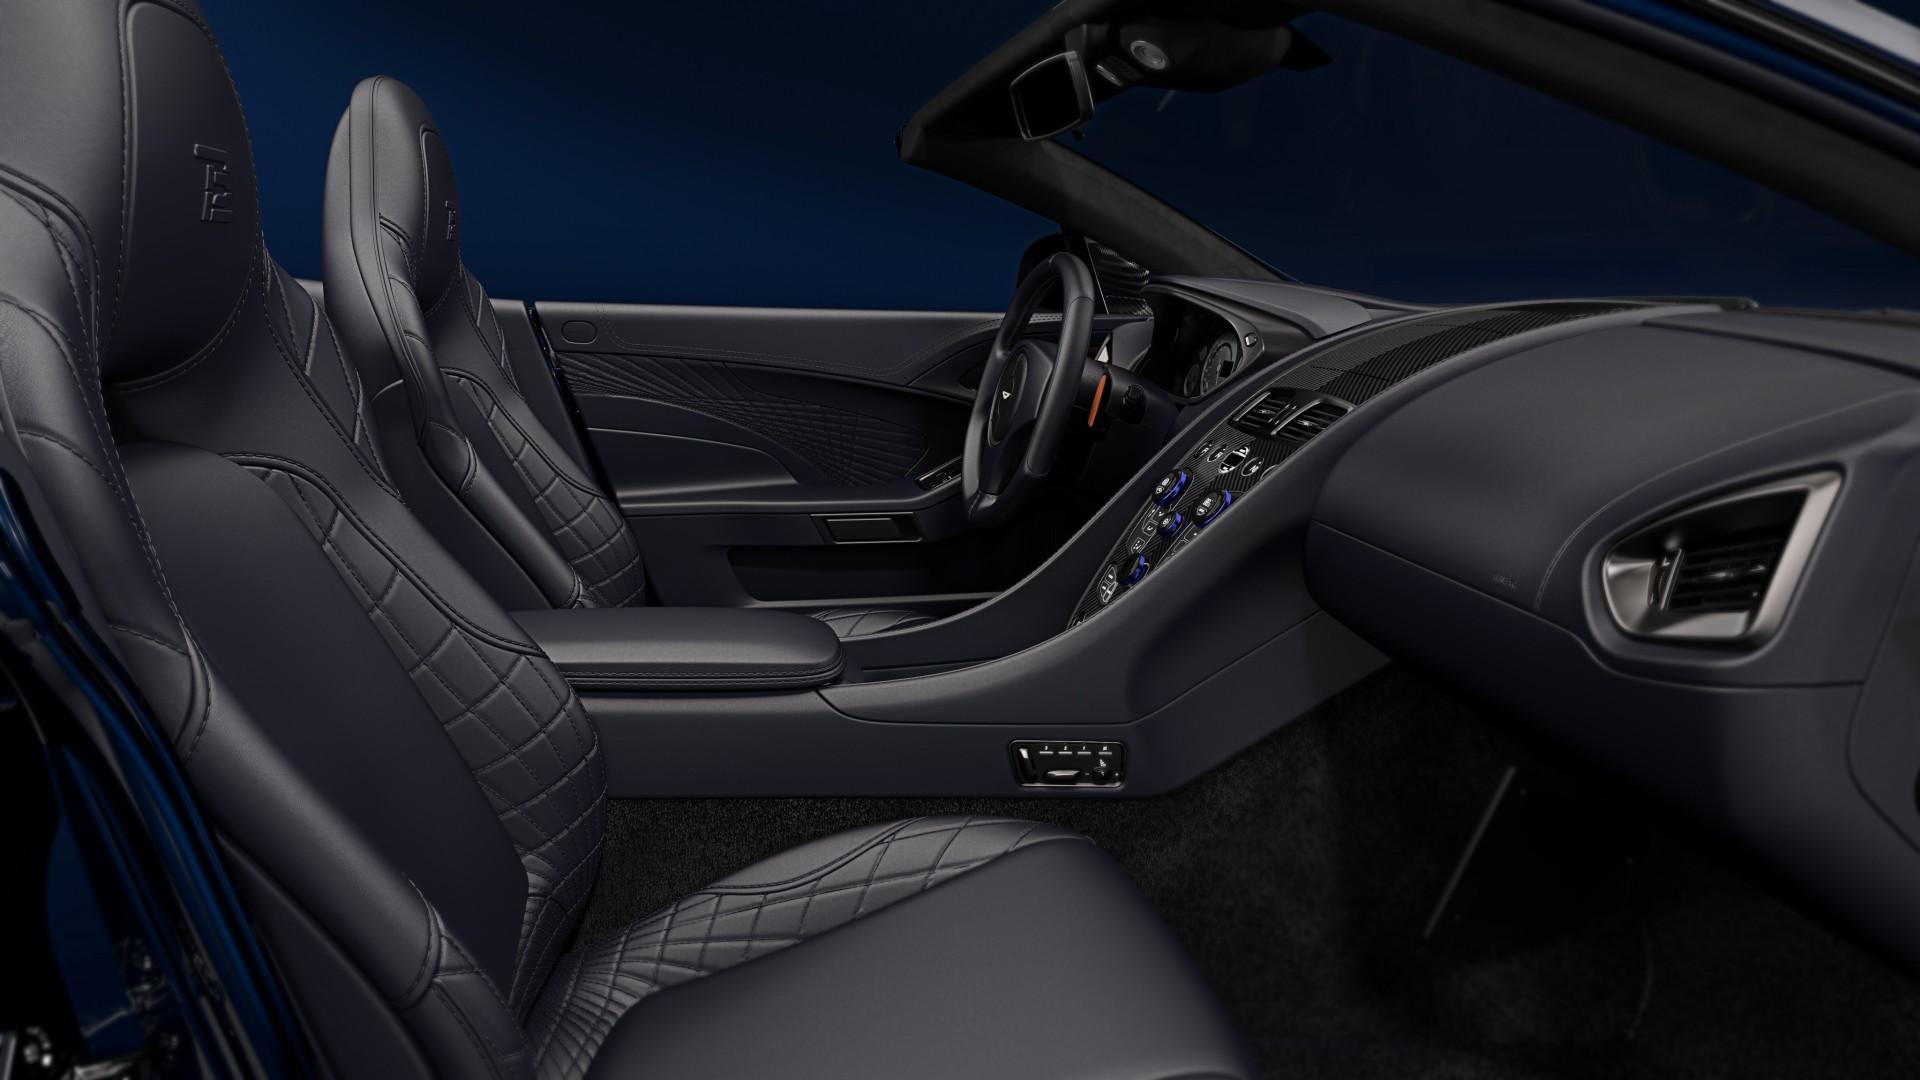 Tom Brady Wallpaper Iphone X 2018 Aston Martin Vanquish S Volante Tom Brady Signature